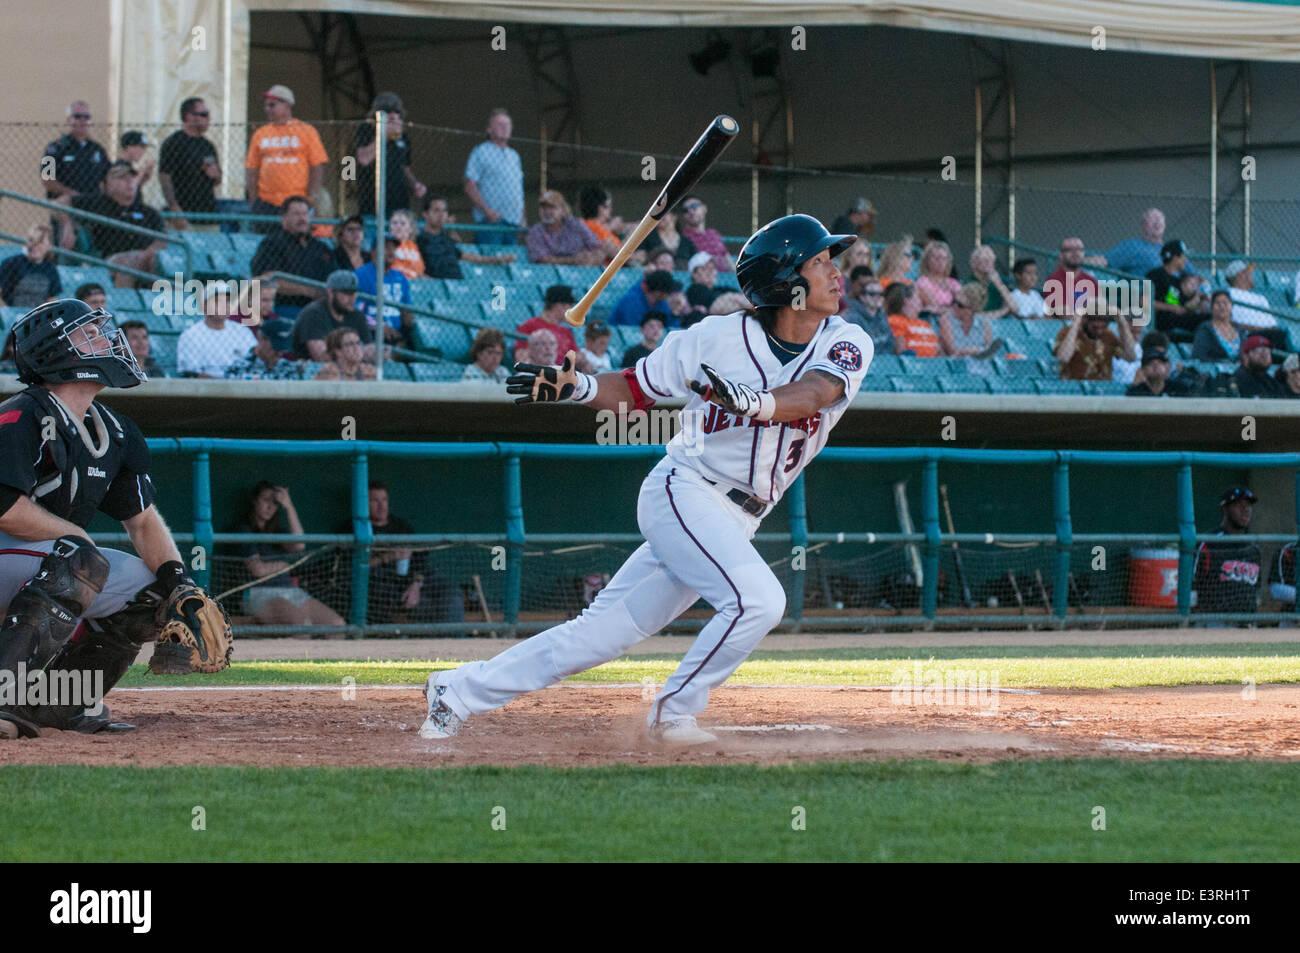 Lancaster, California, USA. 27 June 2014, Lancaster Municipal Stadium, Lancaster, CA. Houston Astros prospect, Chan Stock Photo